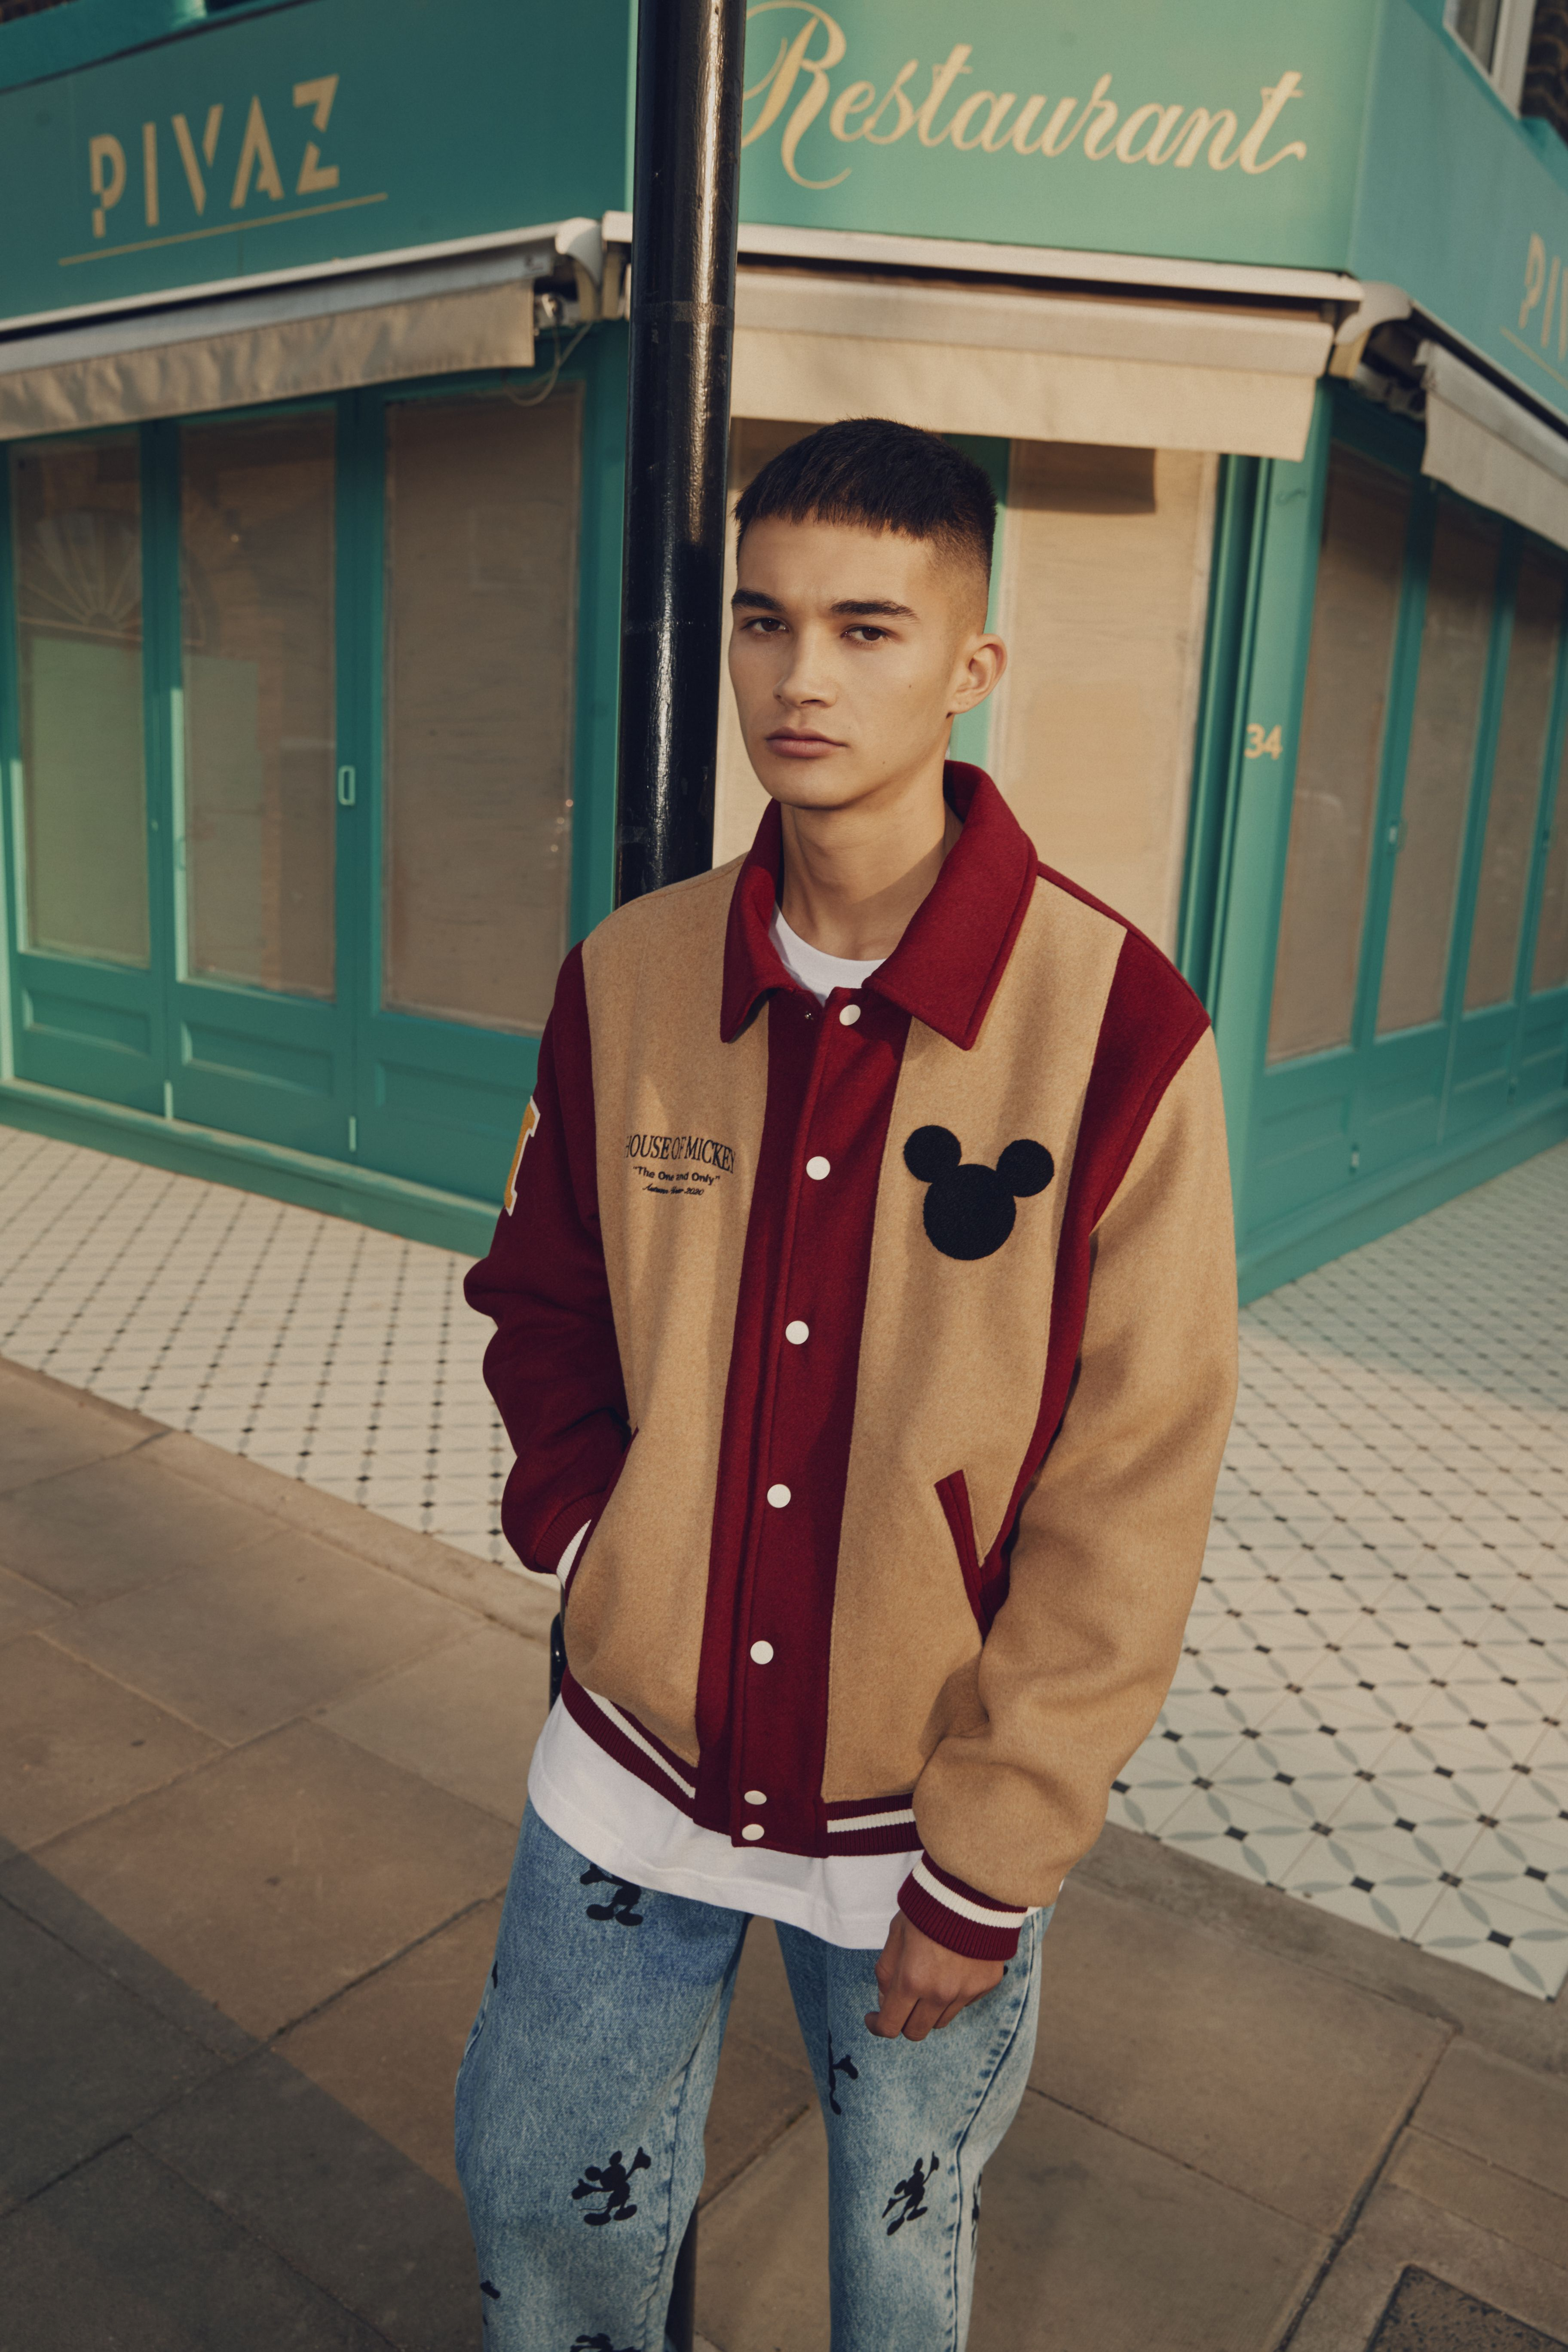 Bershka Mickey Mouse Bershka Bershkastyle Mickeymouse Mickey Disney New In Newin Trend Trendy Cool Fashion Ou Varsity Jacket Street Wear Fashion